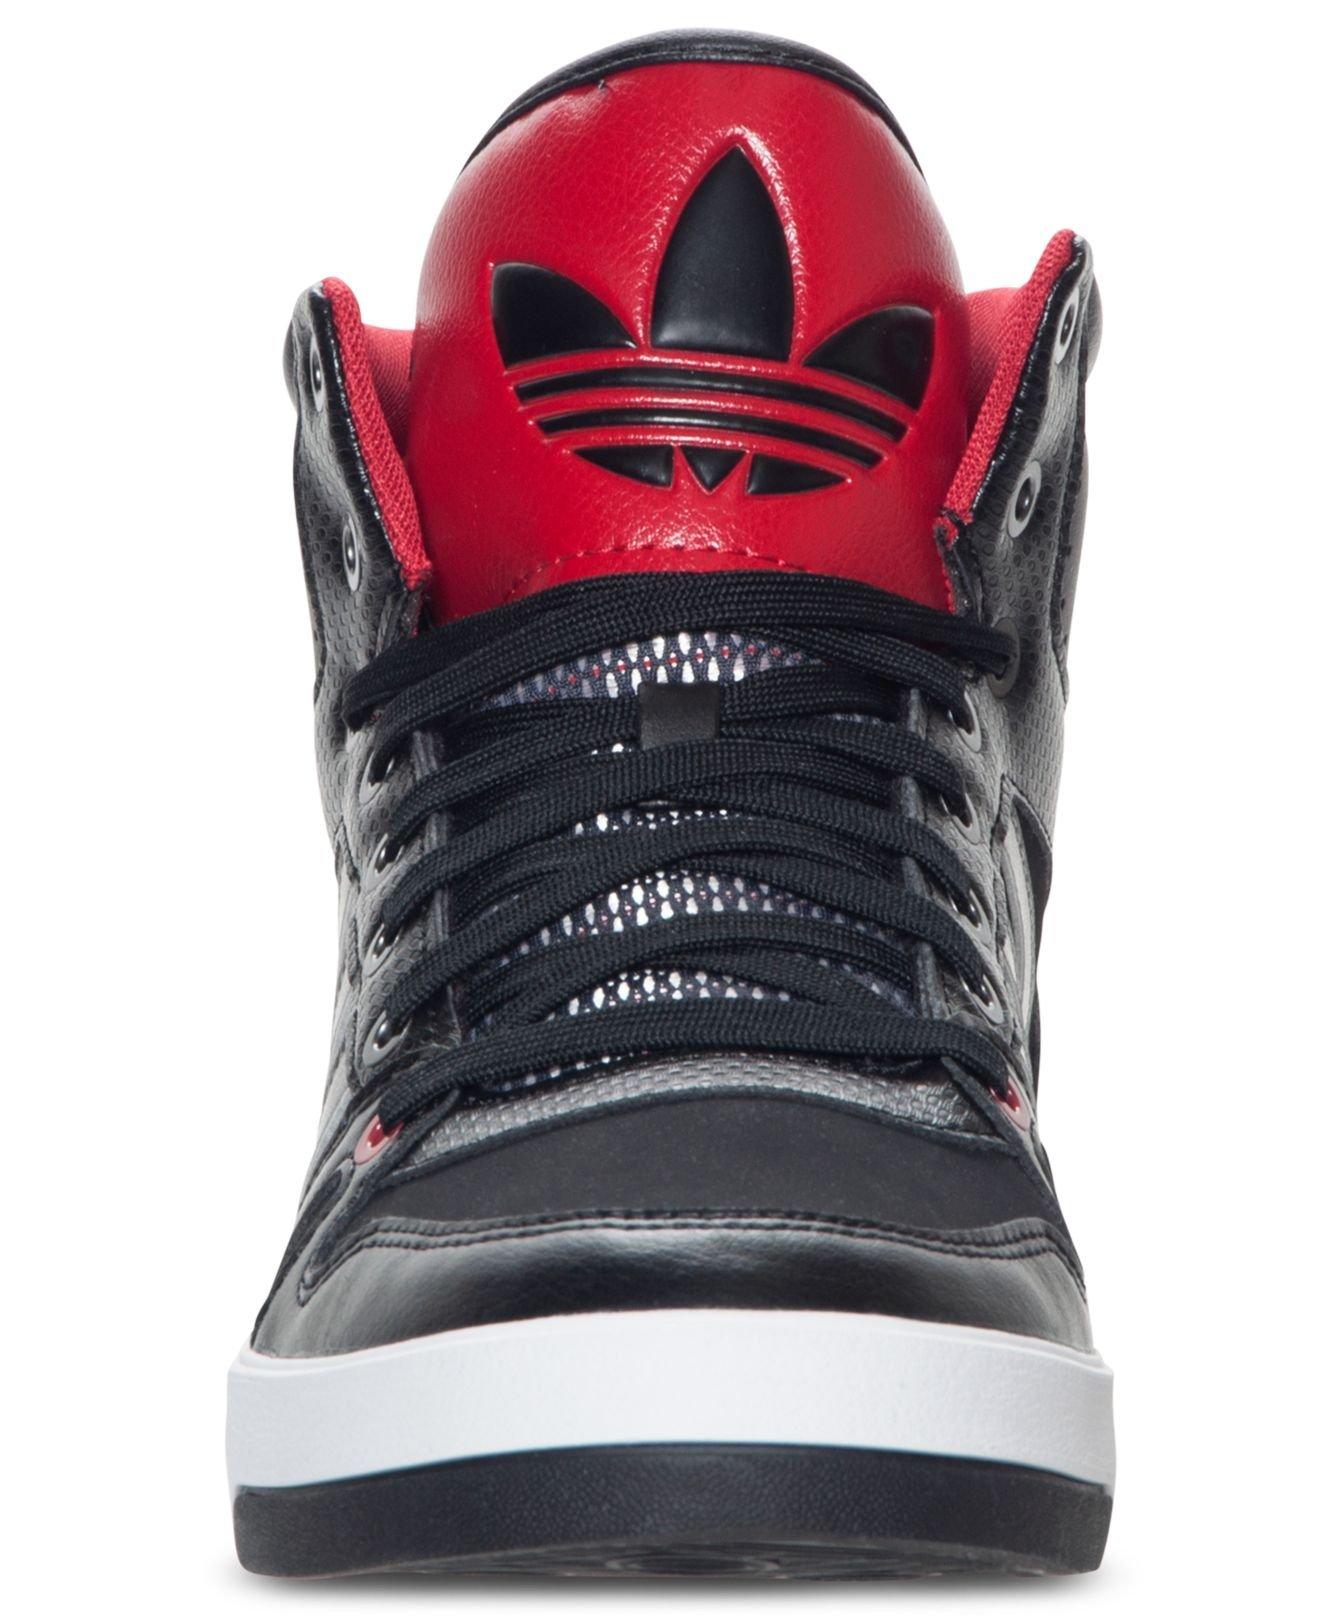 Originals Court Pro Casual Sneakers